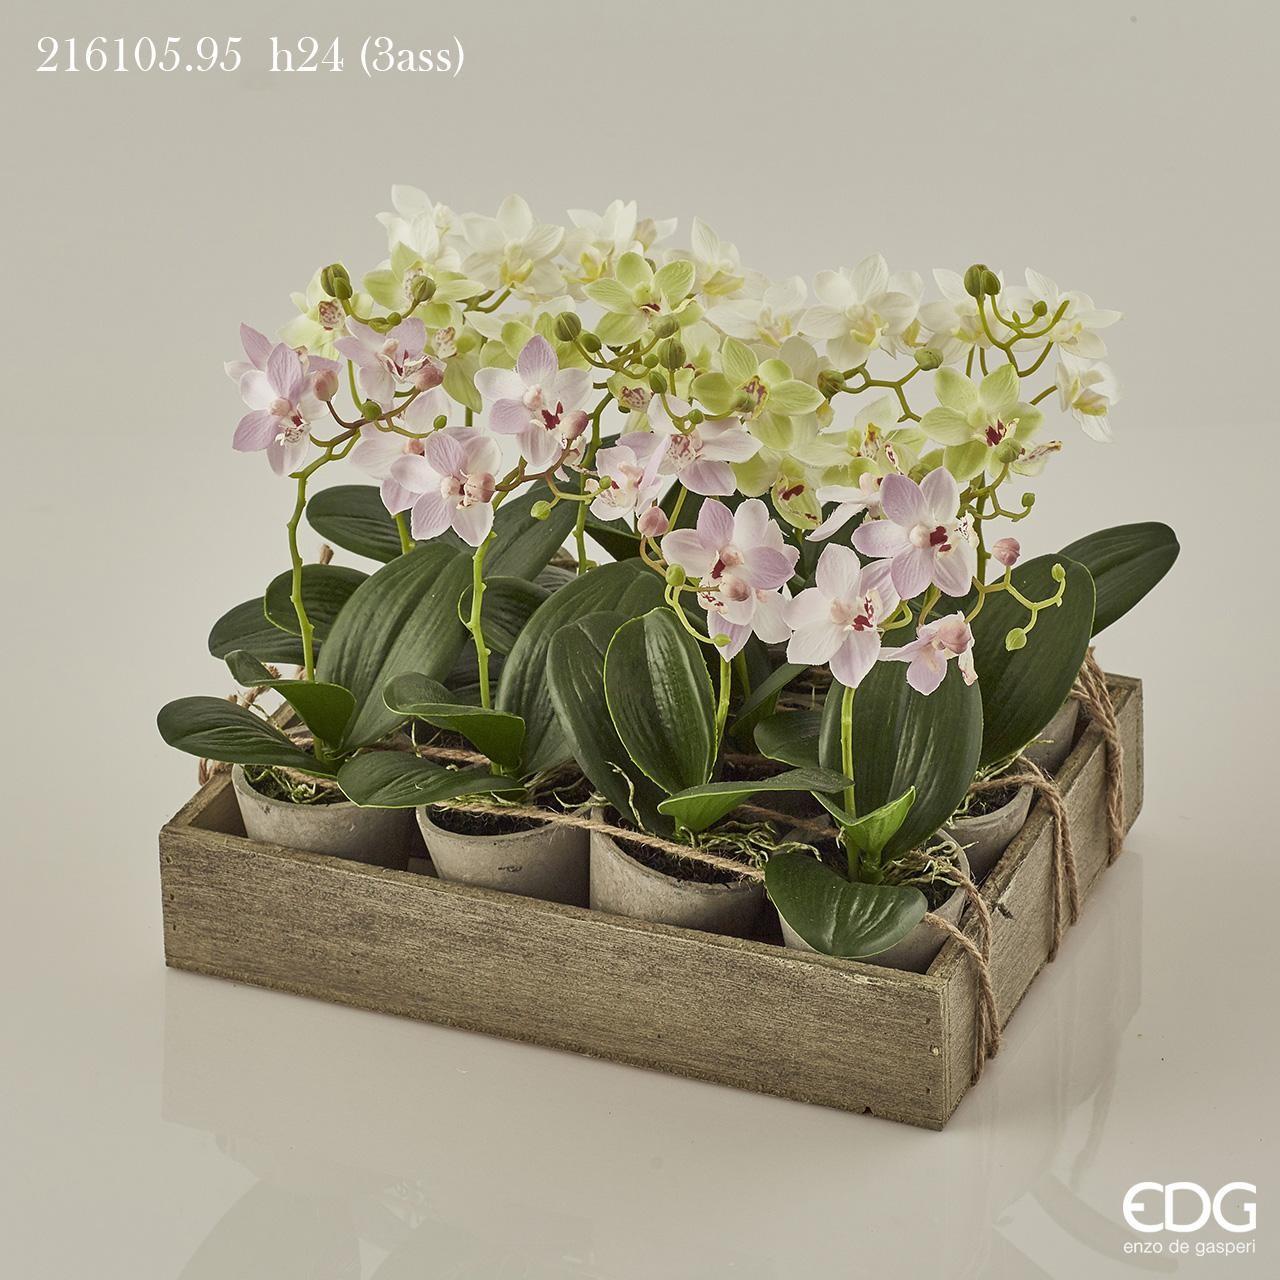 Piantina orchidea phalaenopsis in vaso arte for Vaso orchidea